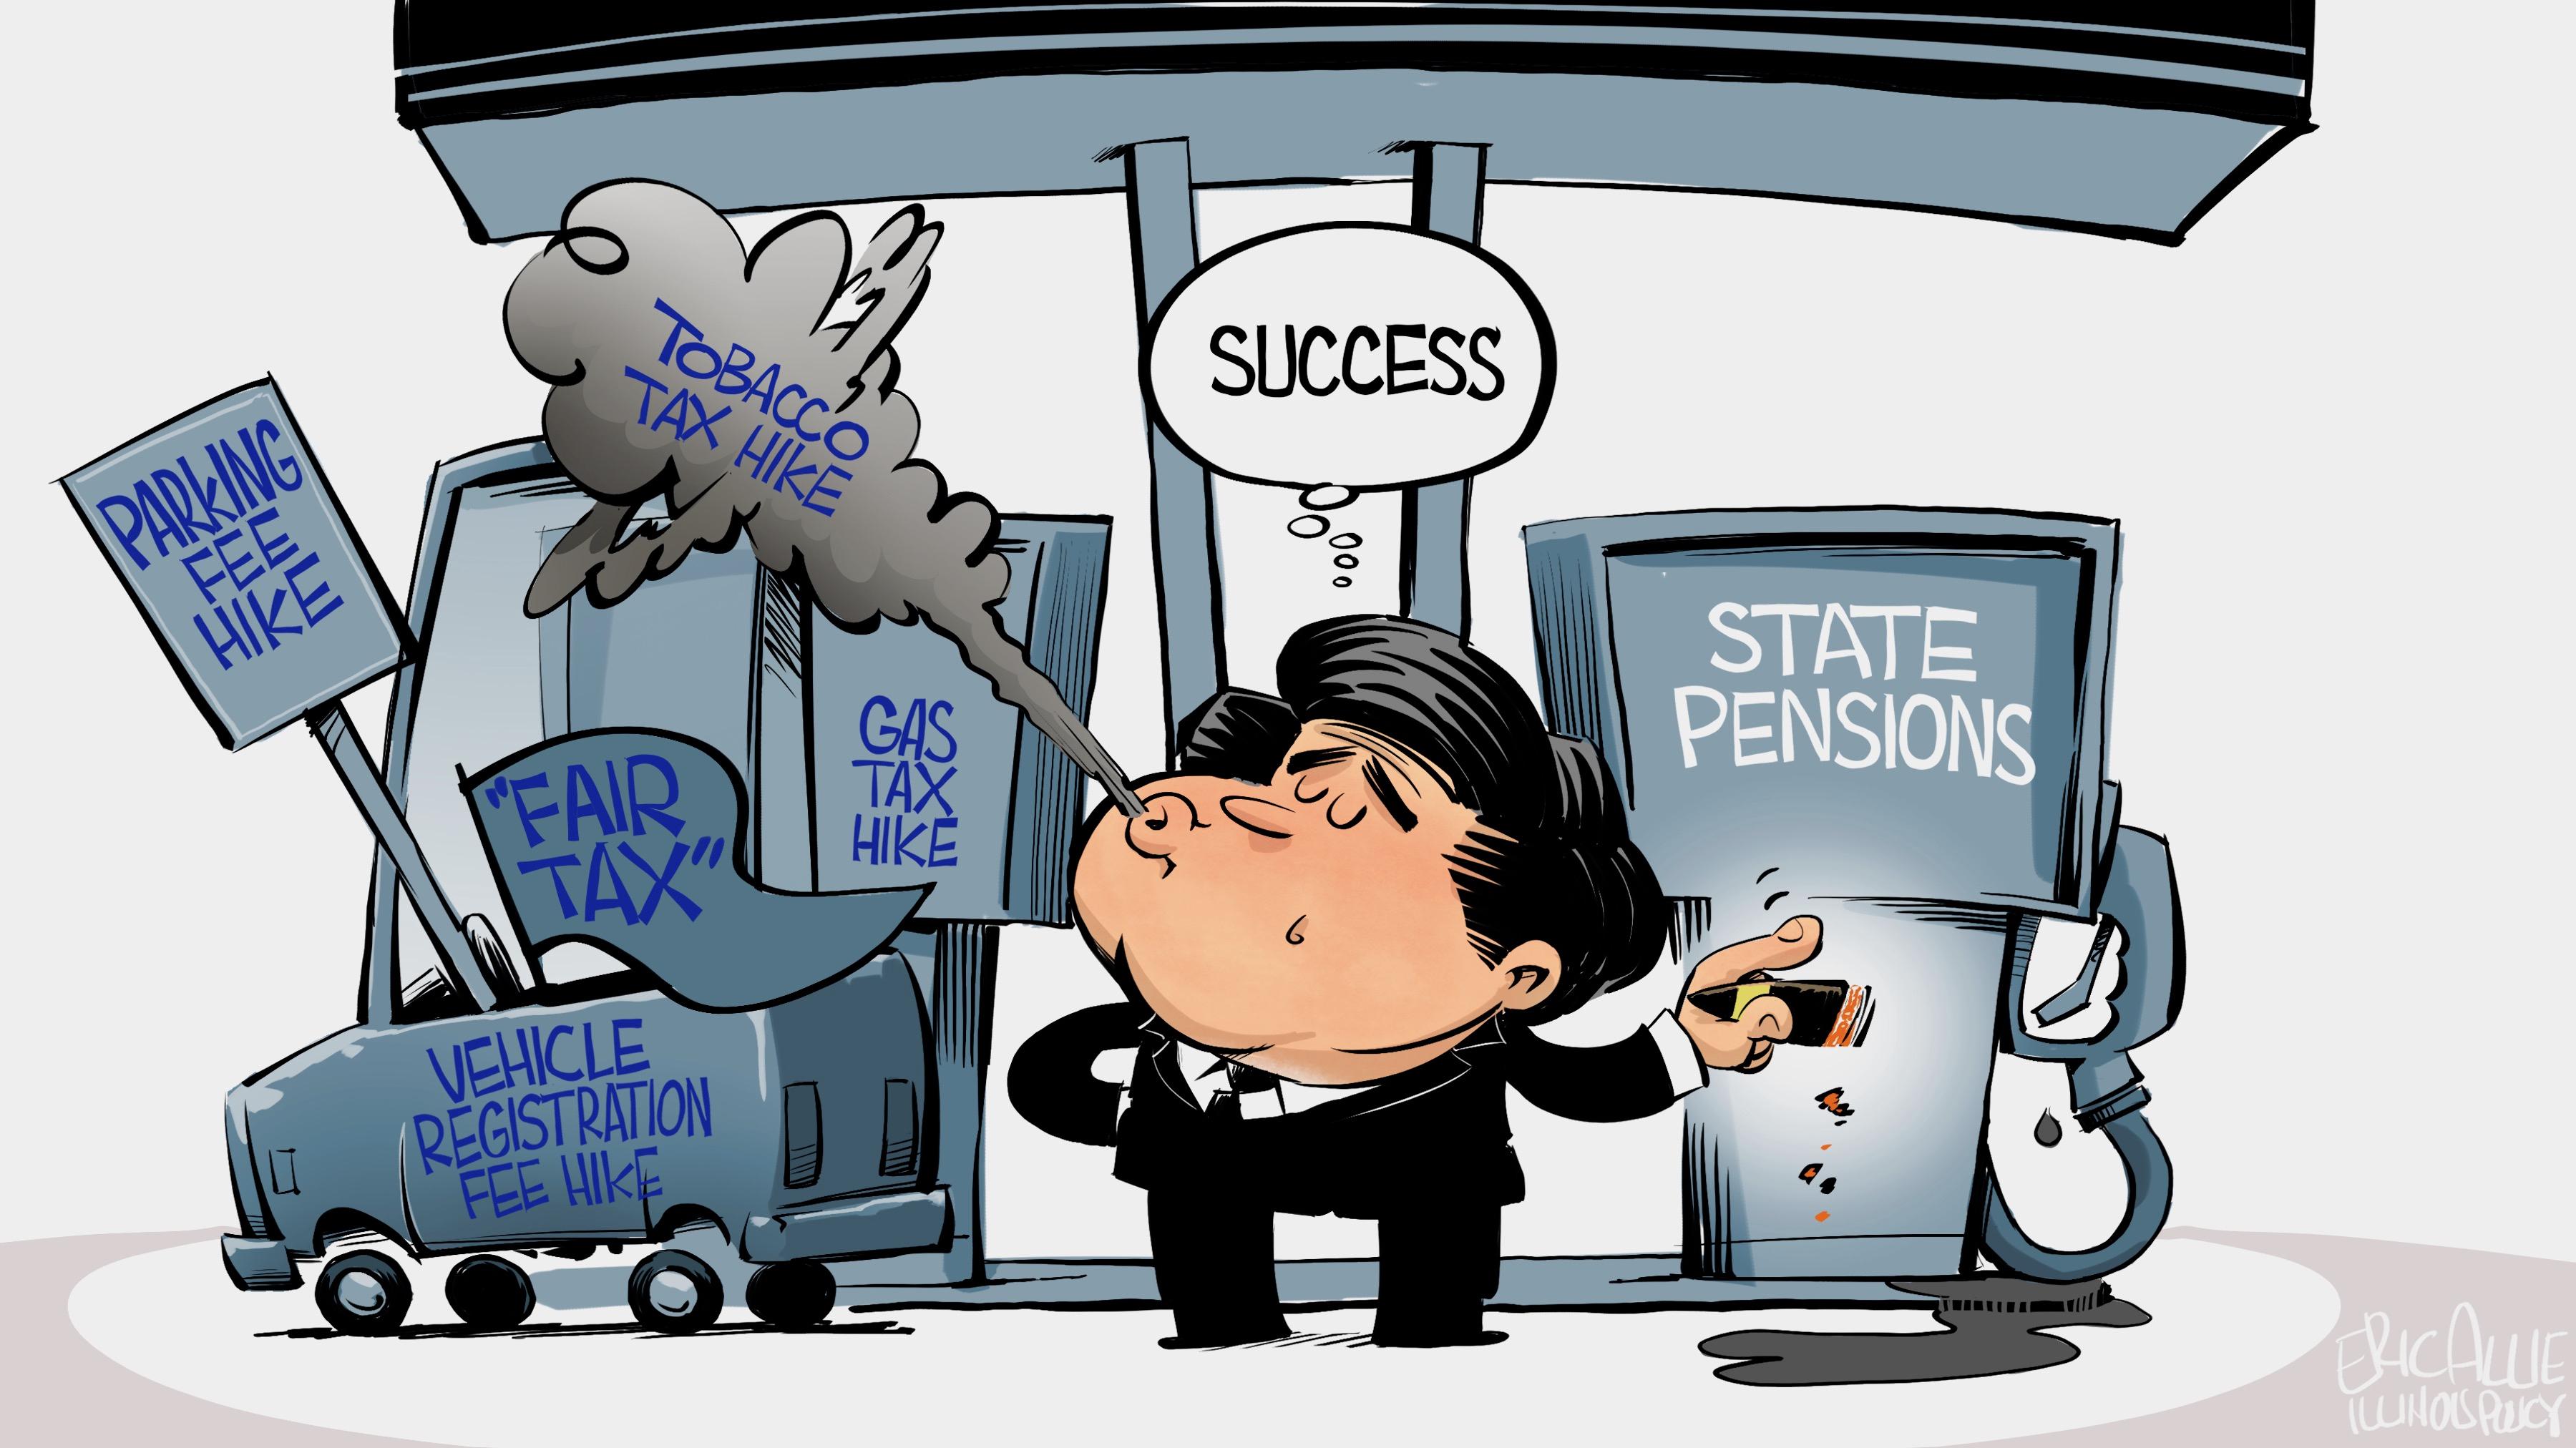 Pritzker's tax hikes: blowing smoke